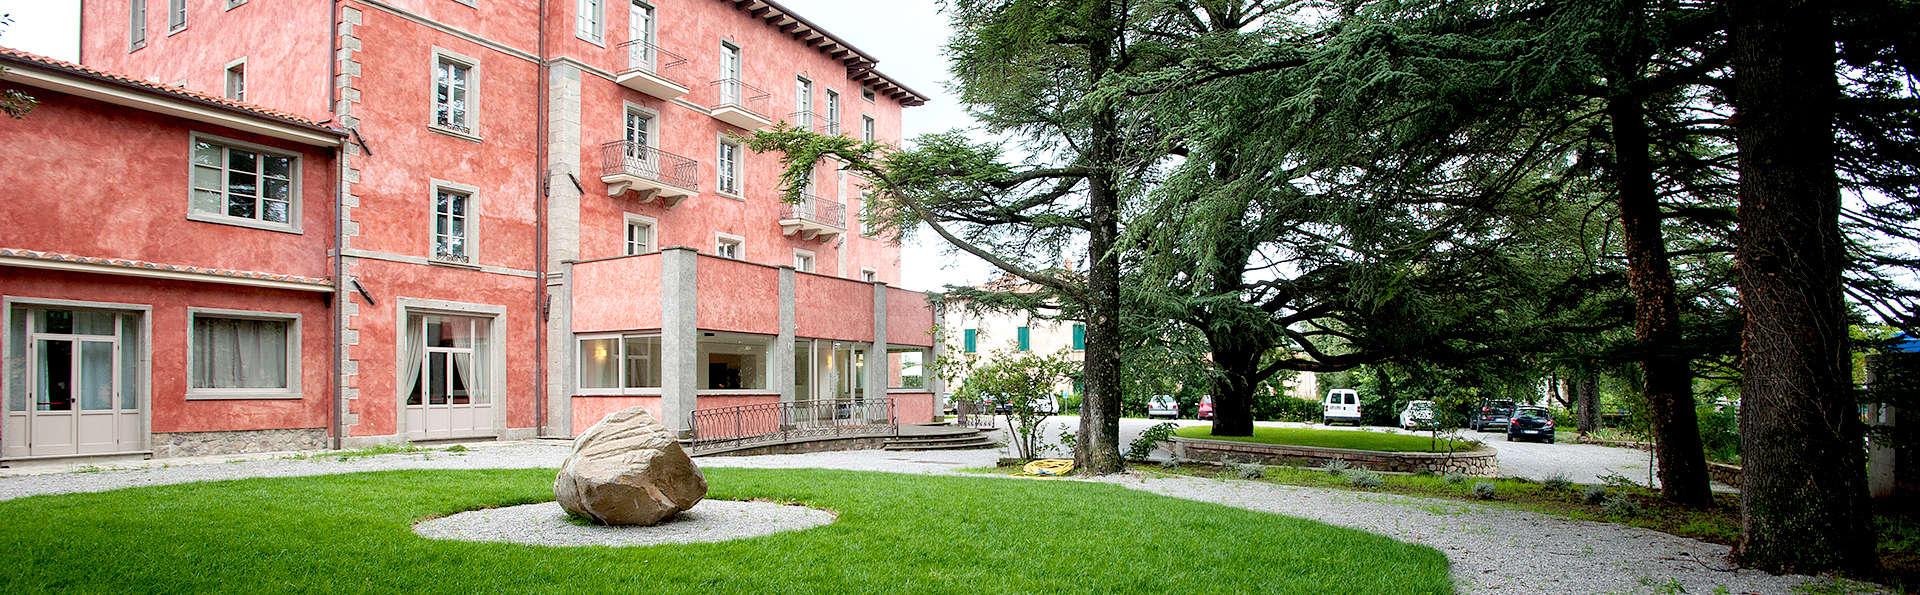 Grand Hotel Impero Spa & Resort - Edit_Front3.jpg